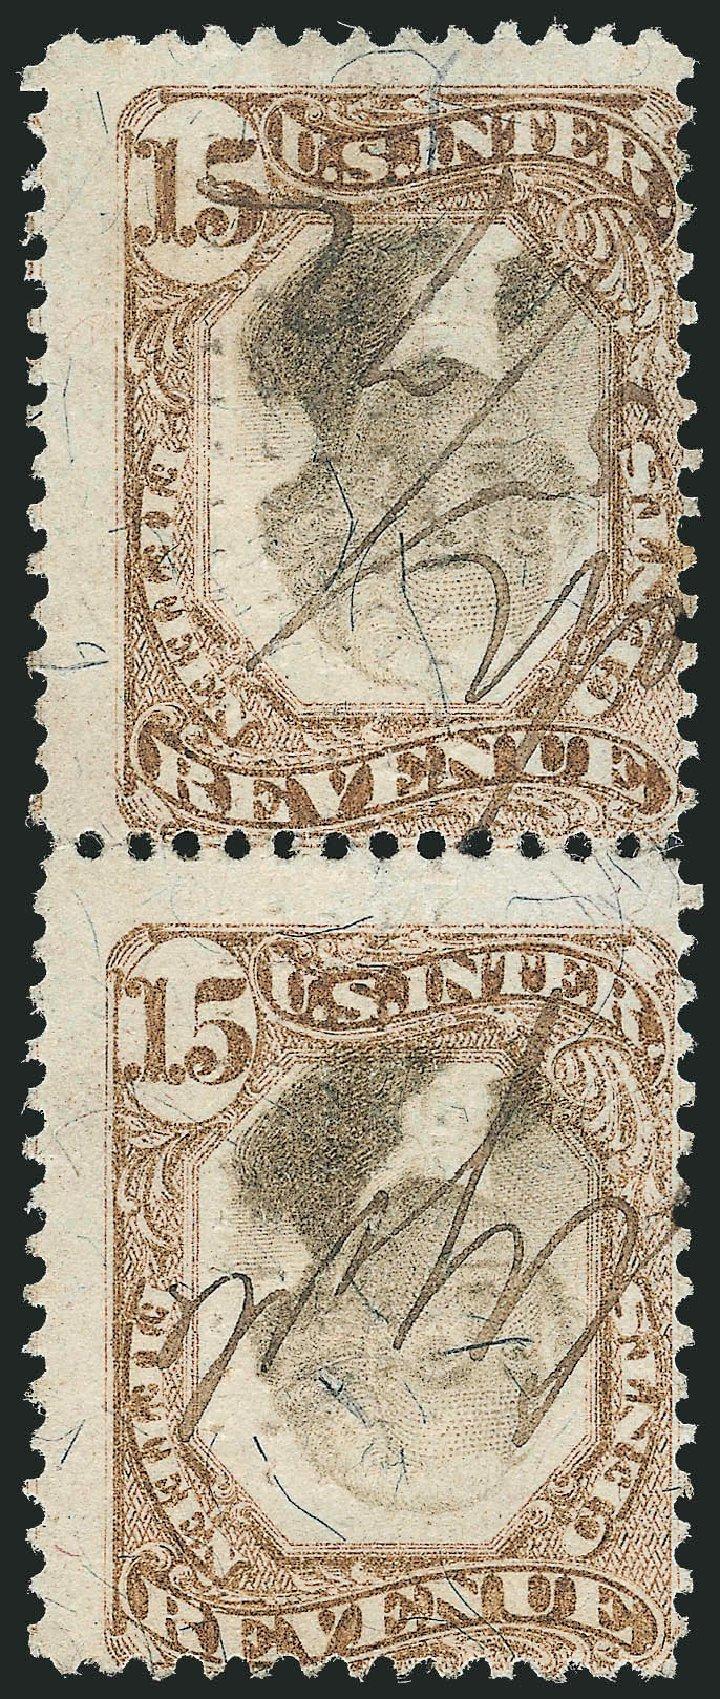 US Stamps Price Scott Catalog #R139 - 1872 15c Revenue Documentary . Robert Siegel Auction Galleries, Dec 2014, Sale 1089, Lot 528